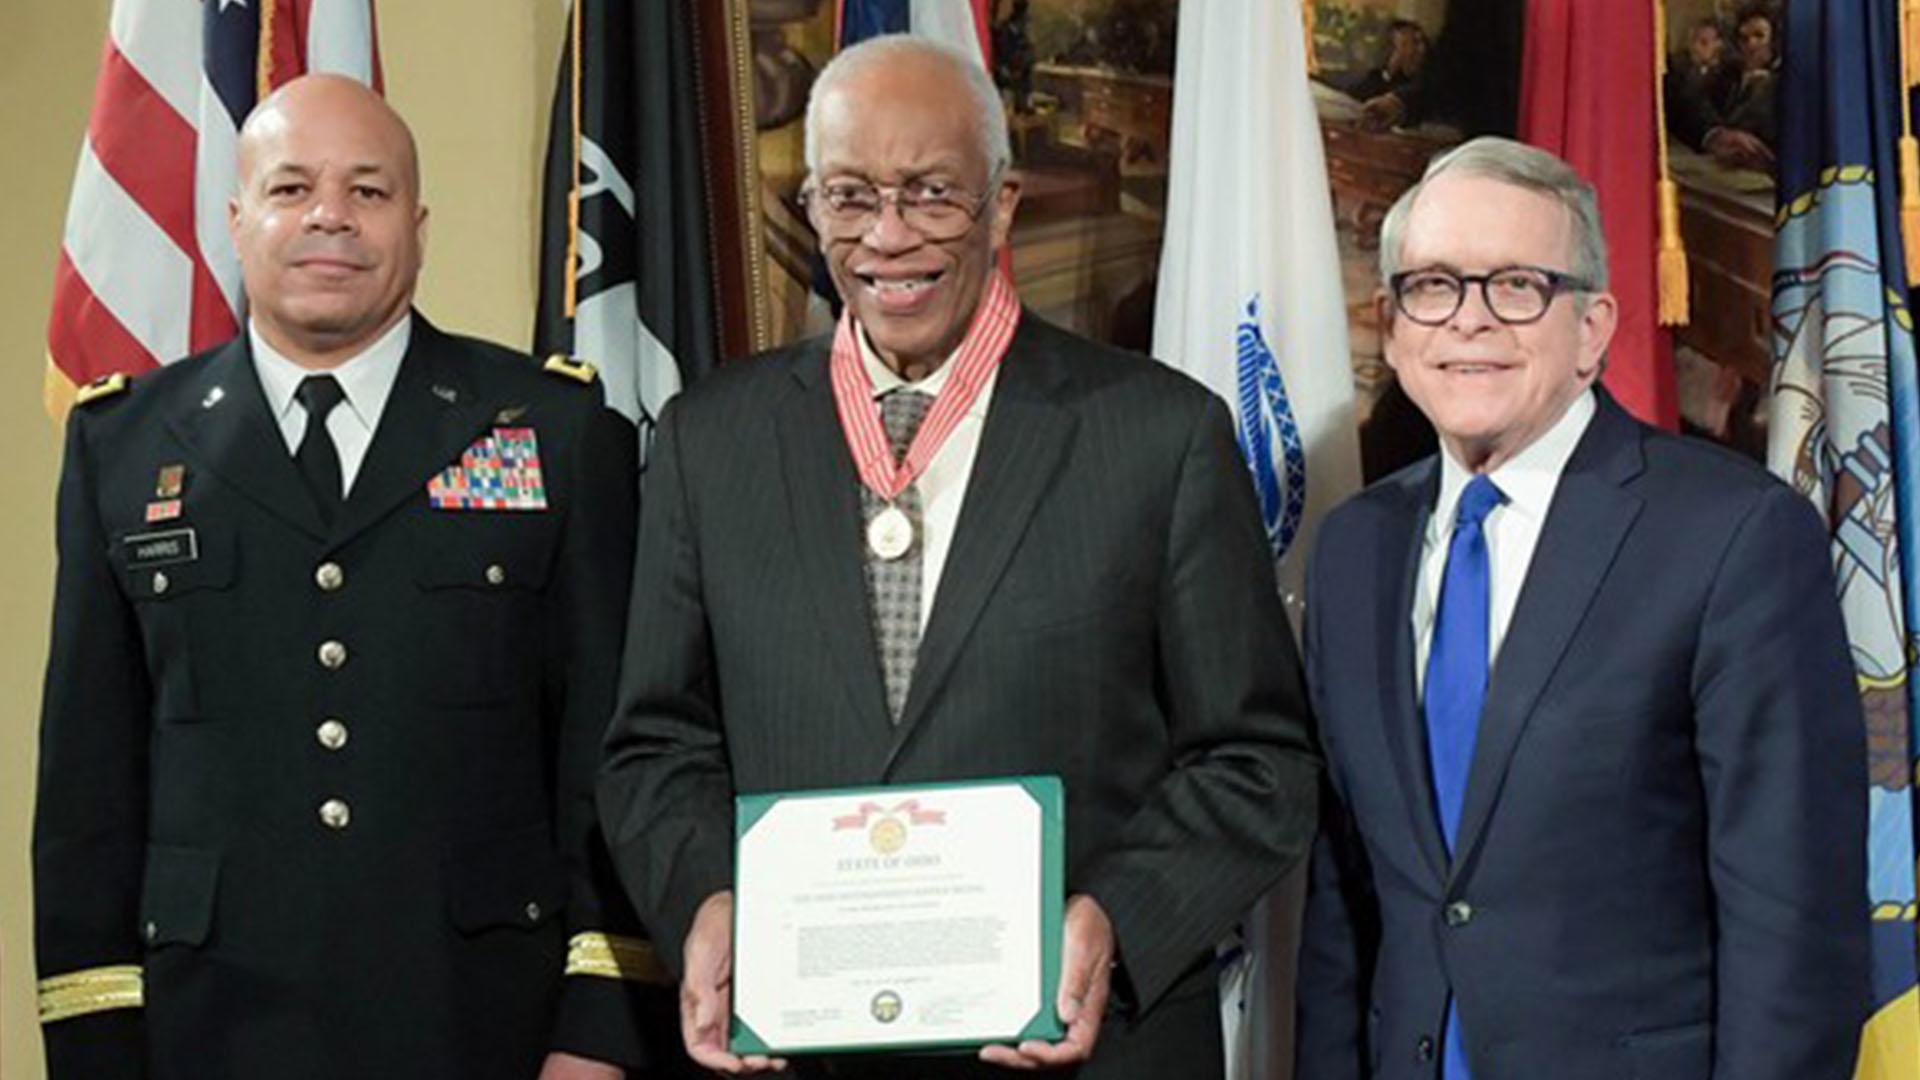 2-20 Ohio Distinguished Service Medal 1